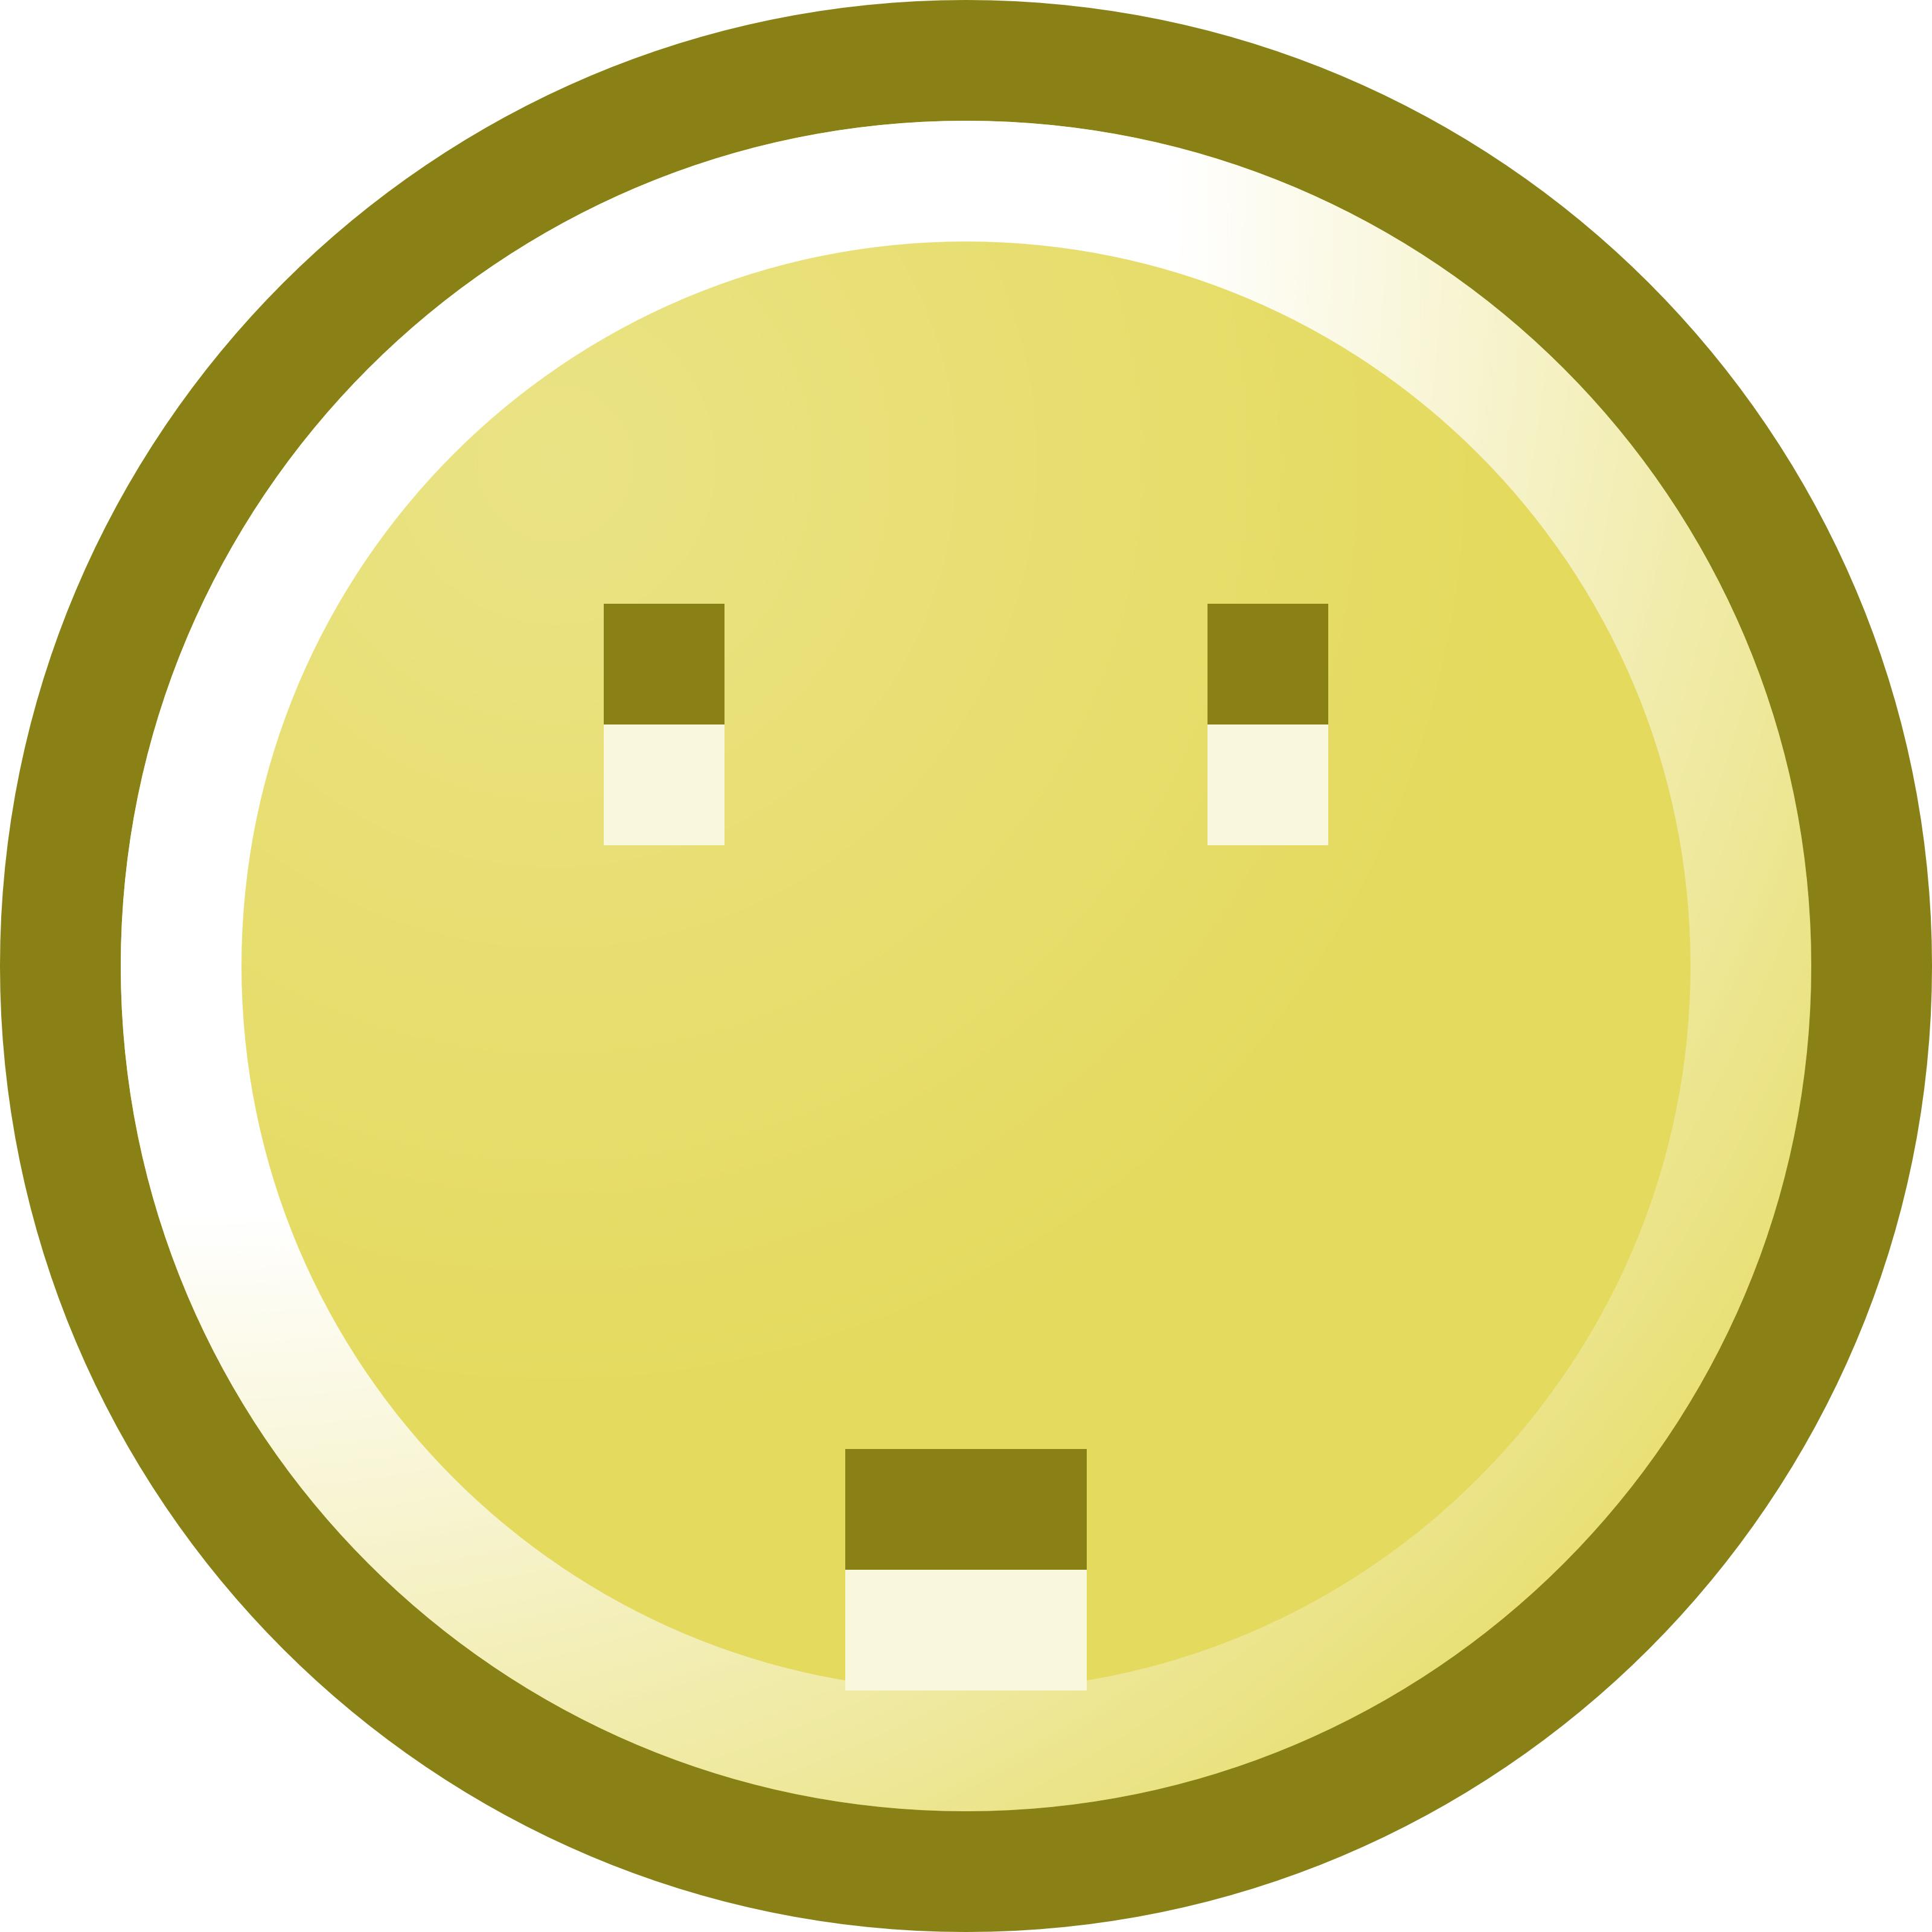 3200x3200 Worried Smiley Face Clip Art Illustration